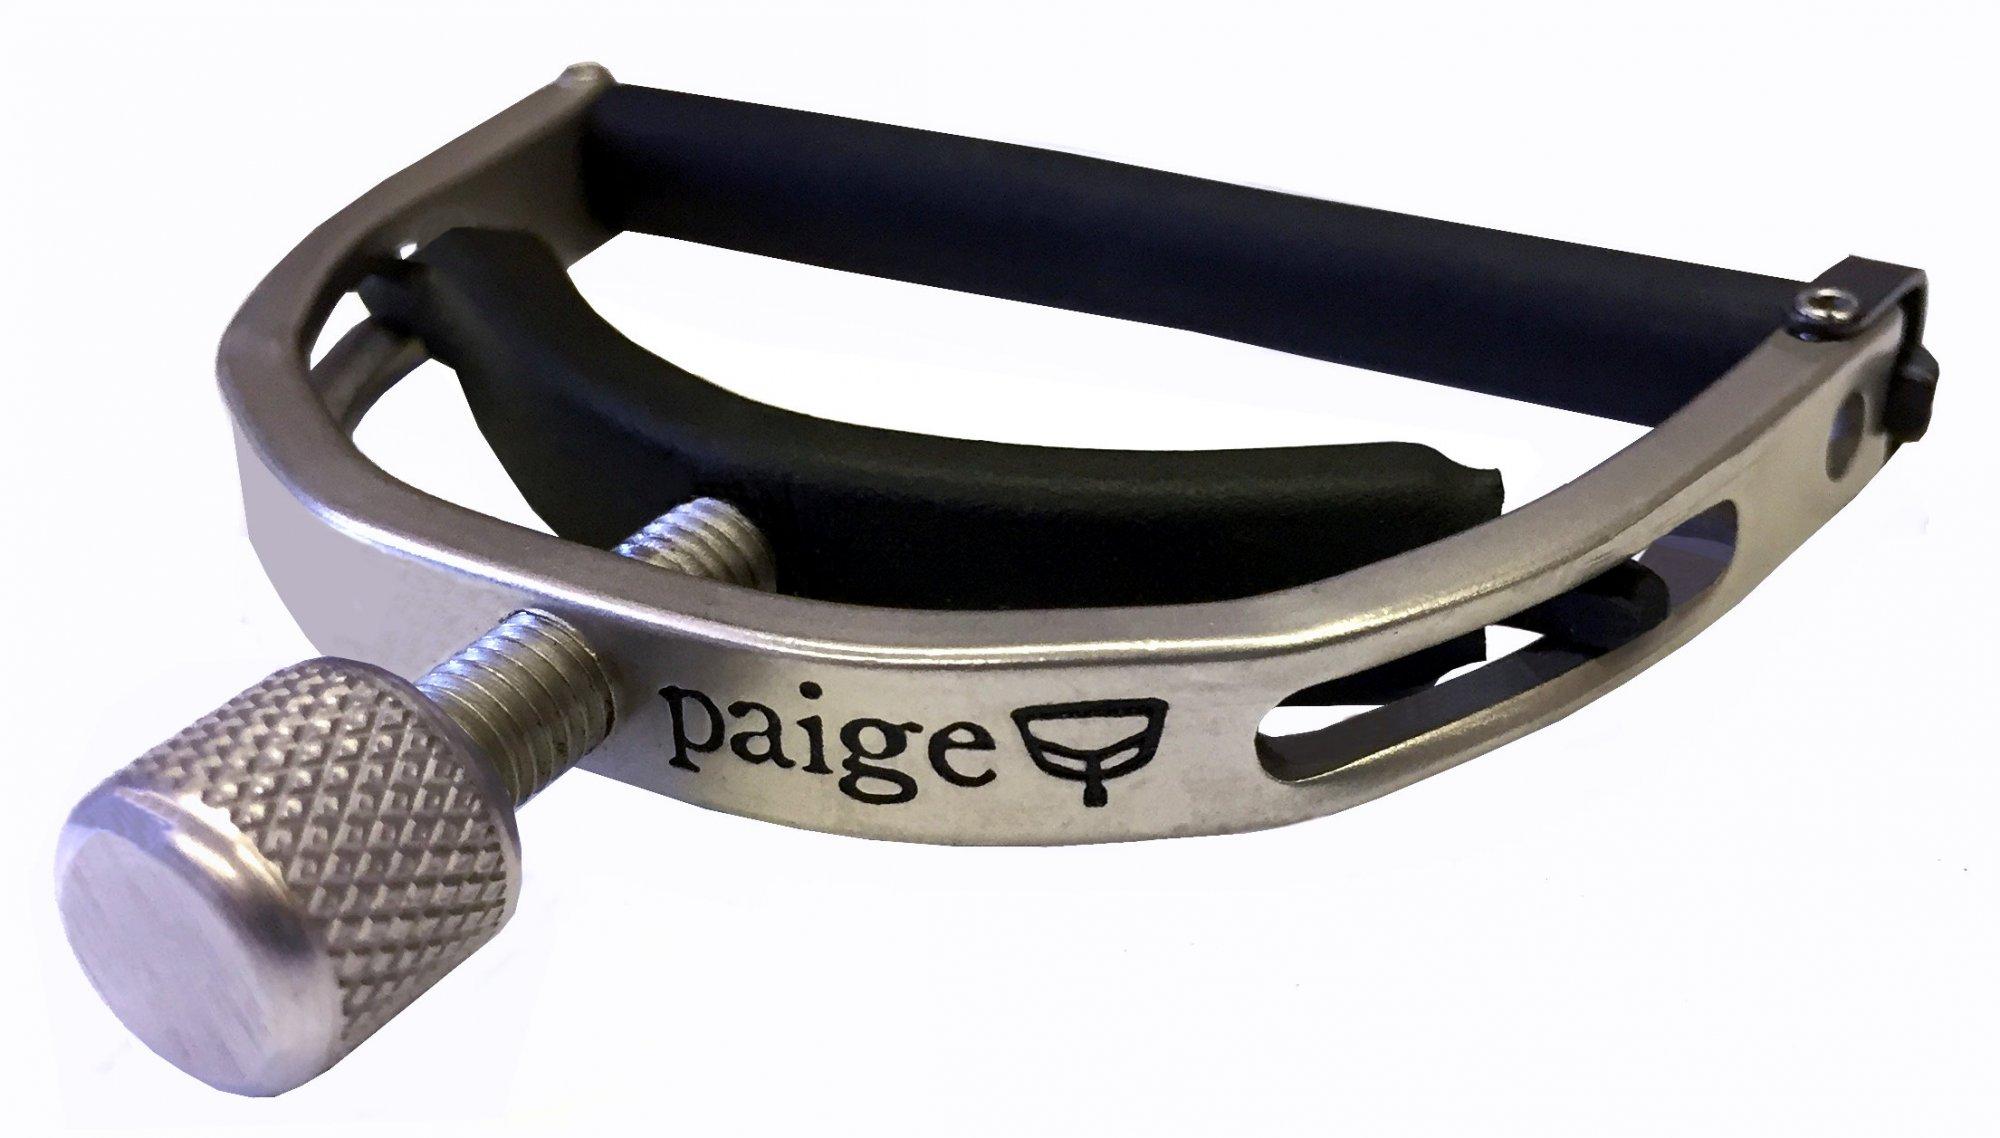 Paige Original Six String Guitar Capo Nickel (PO-6-N)